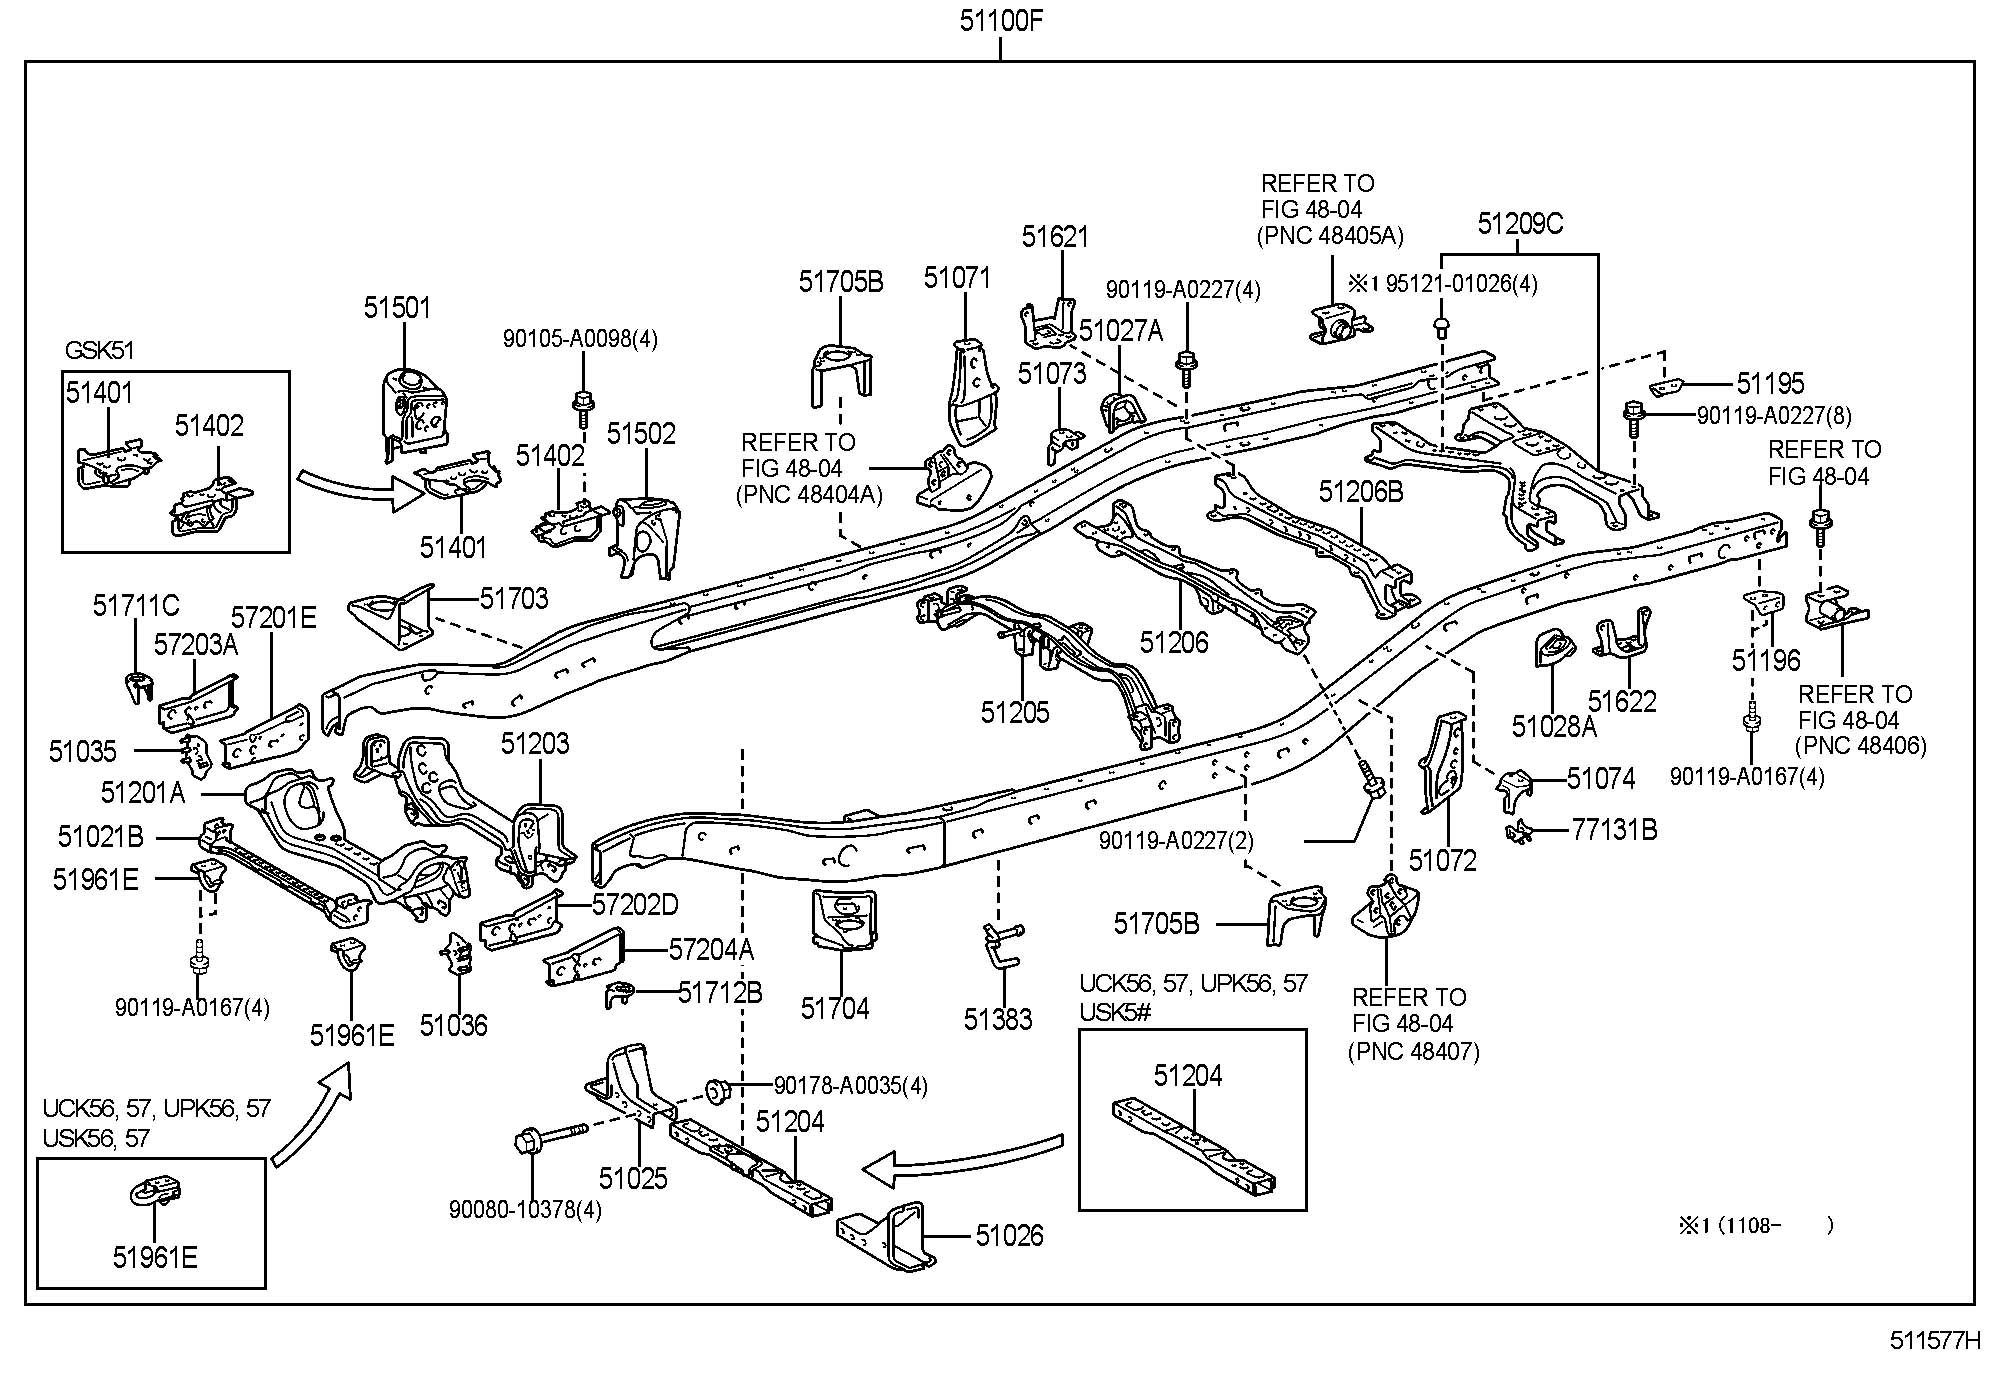 Toyota Tundra Crossmember Sub Assembly Frame No 4